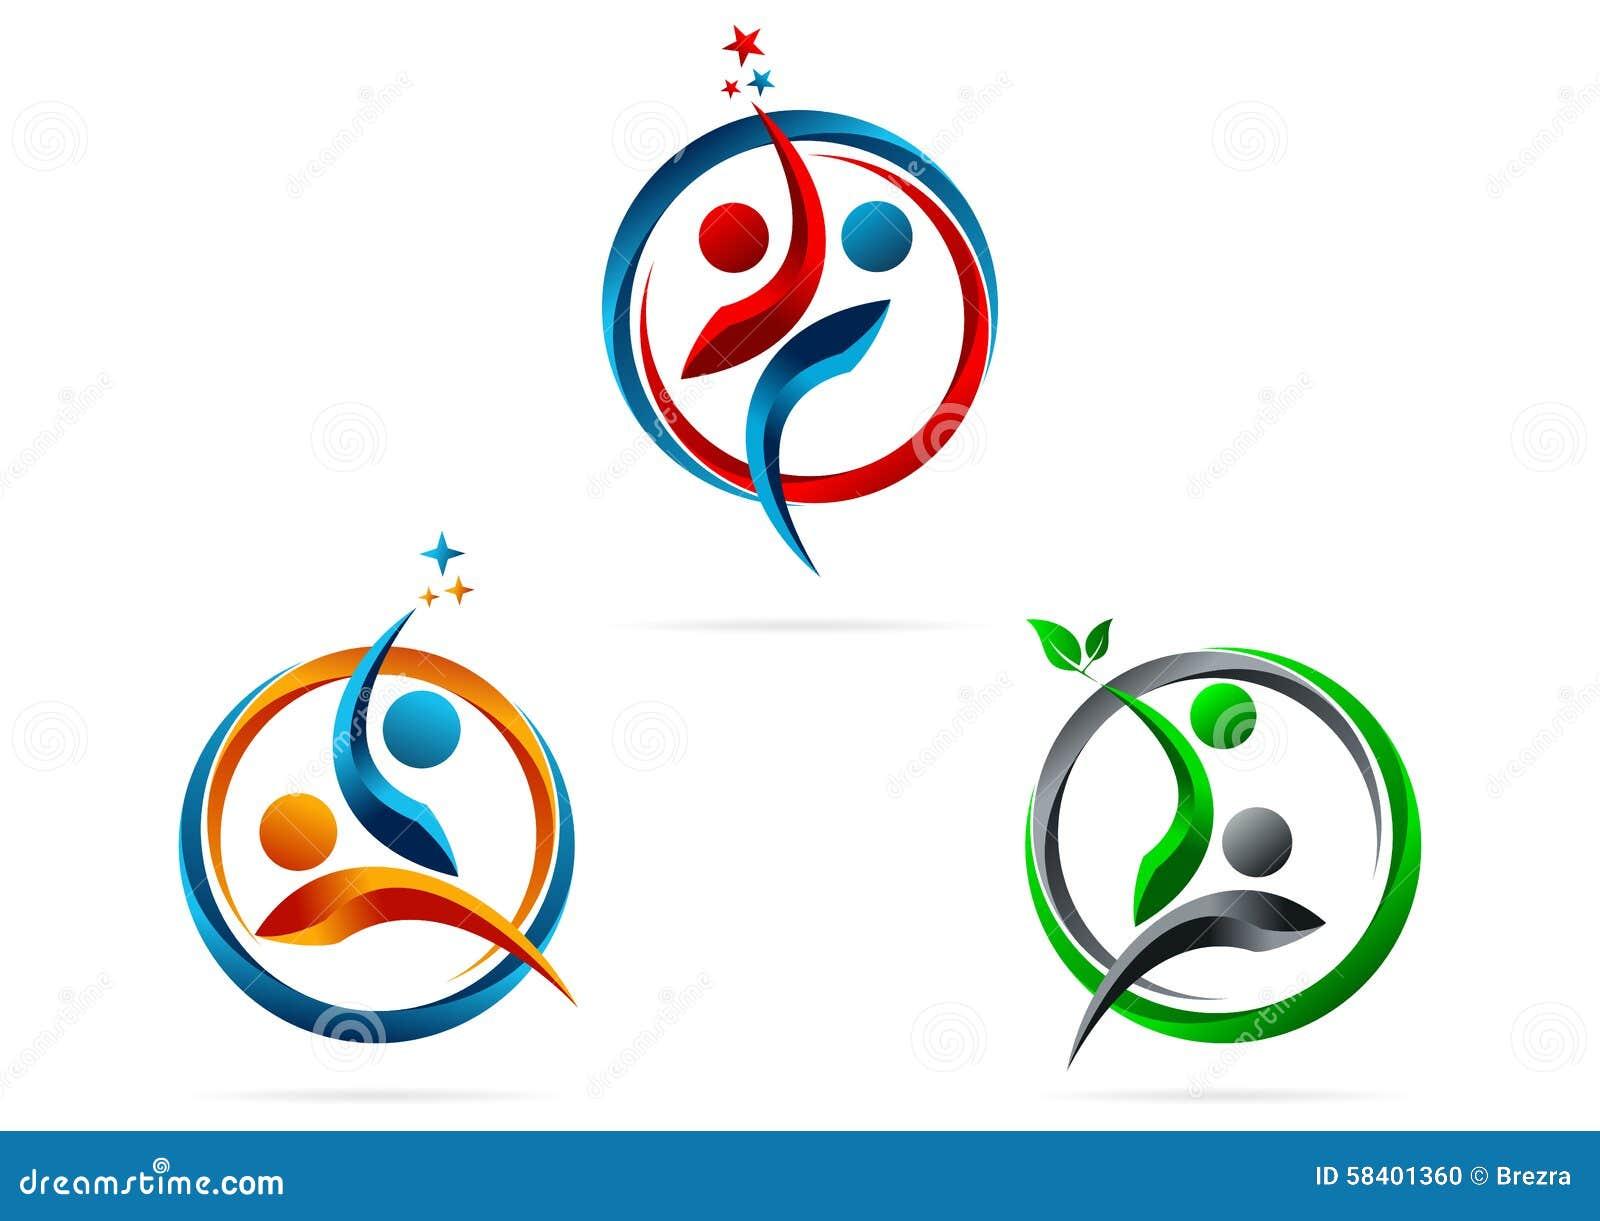 Partnership Logo Star Success People Symbol Healthy Team